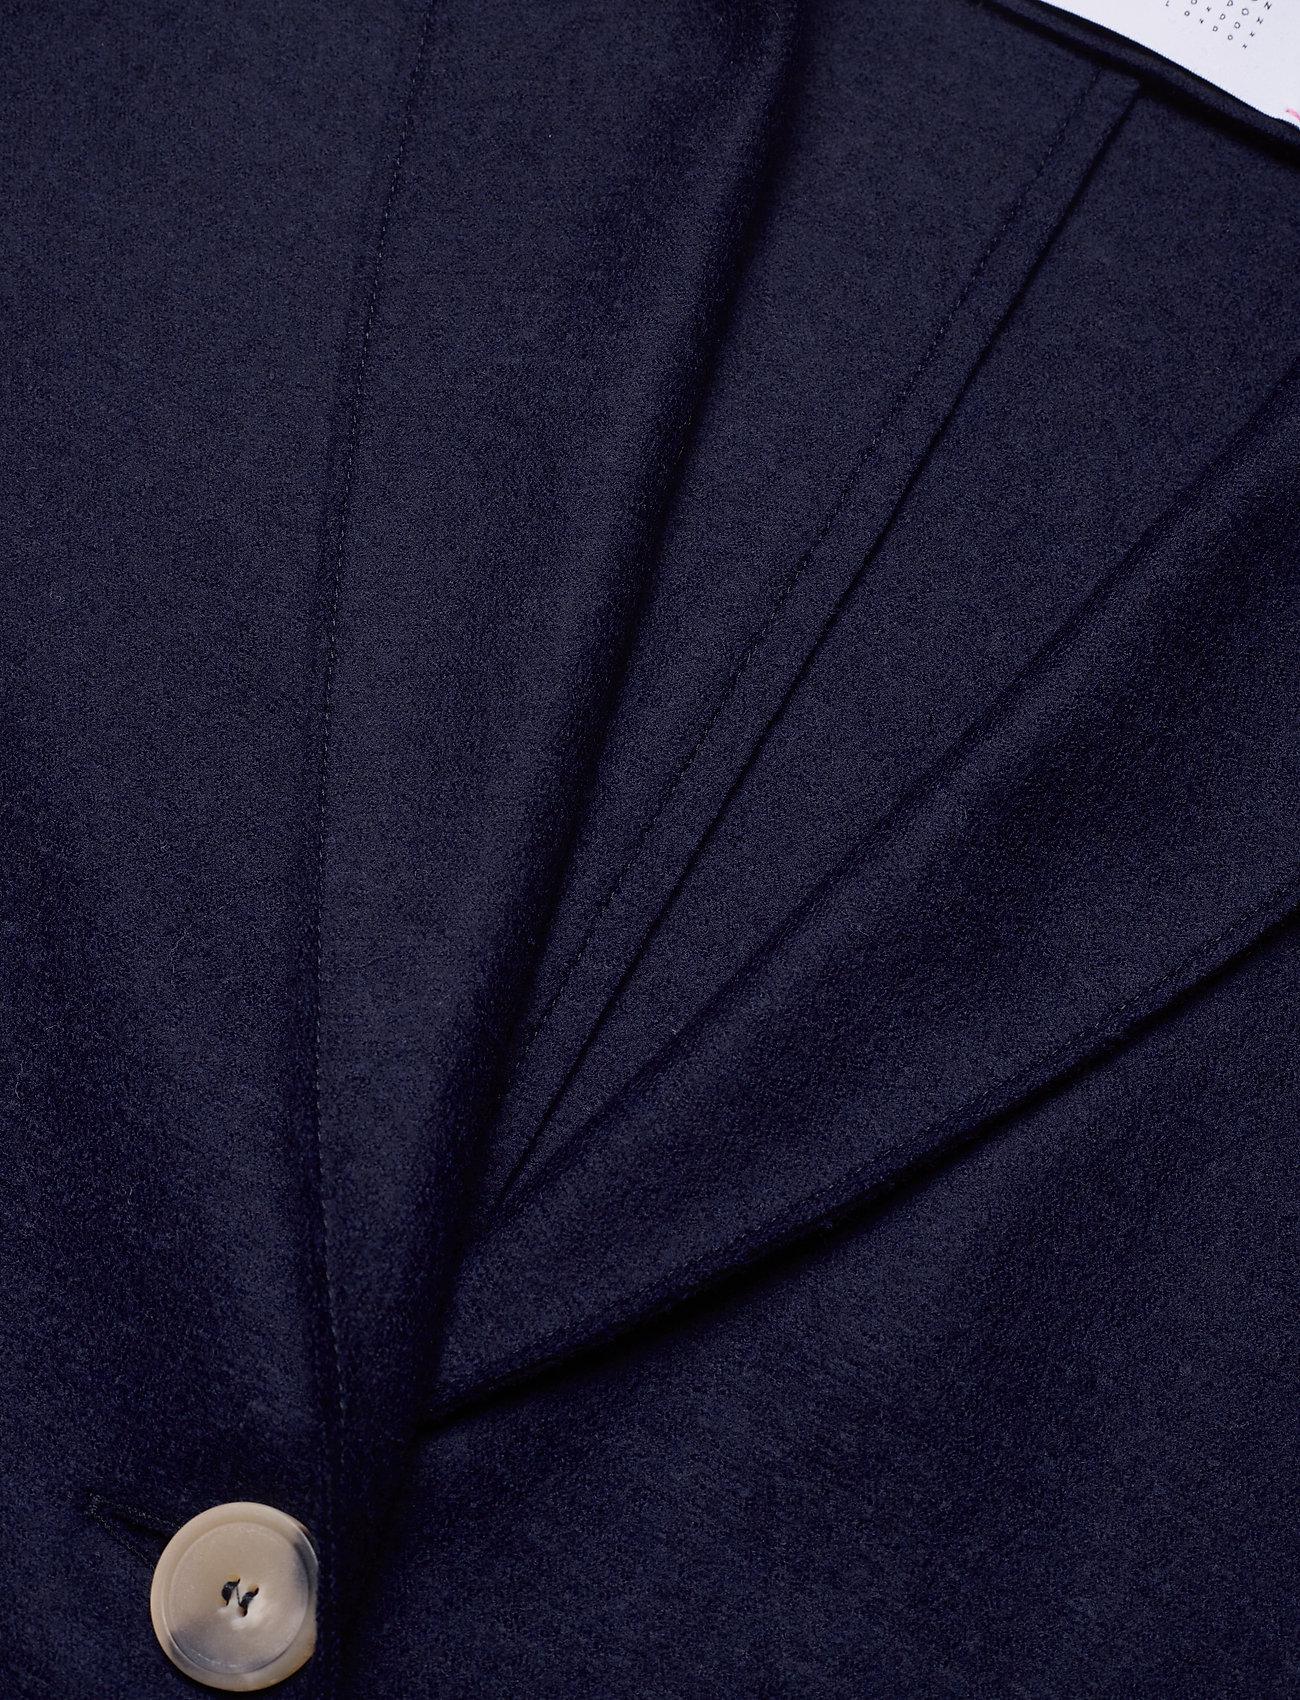 Harris Wharf London - Women Overcoat Light Pressed Wool - wollmäntel - navy blue - 2